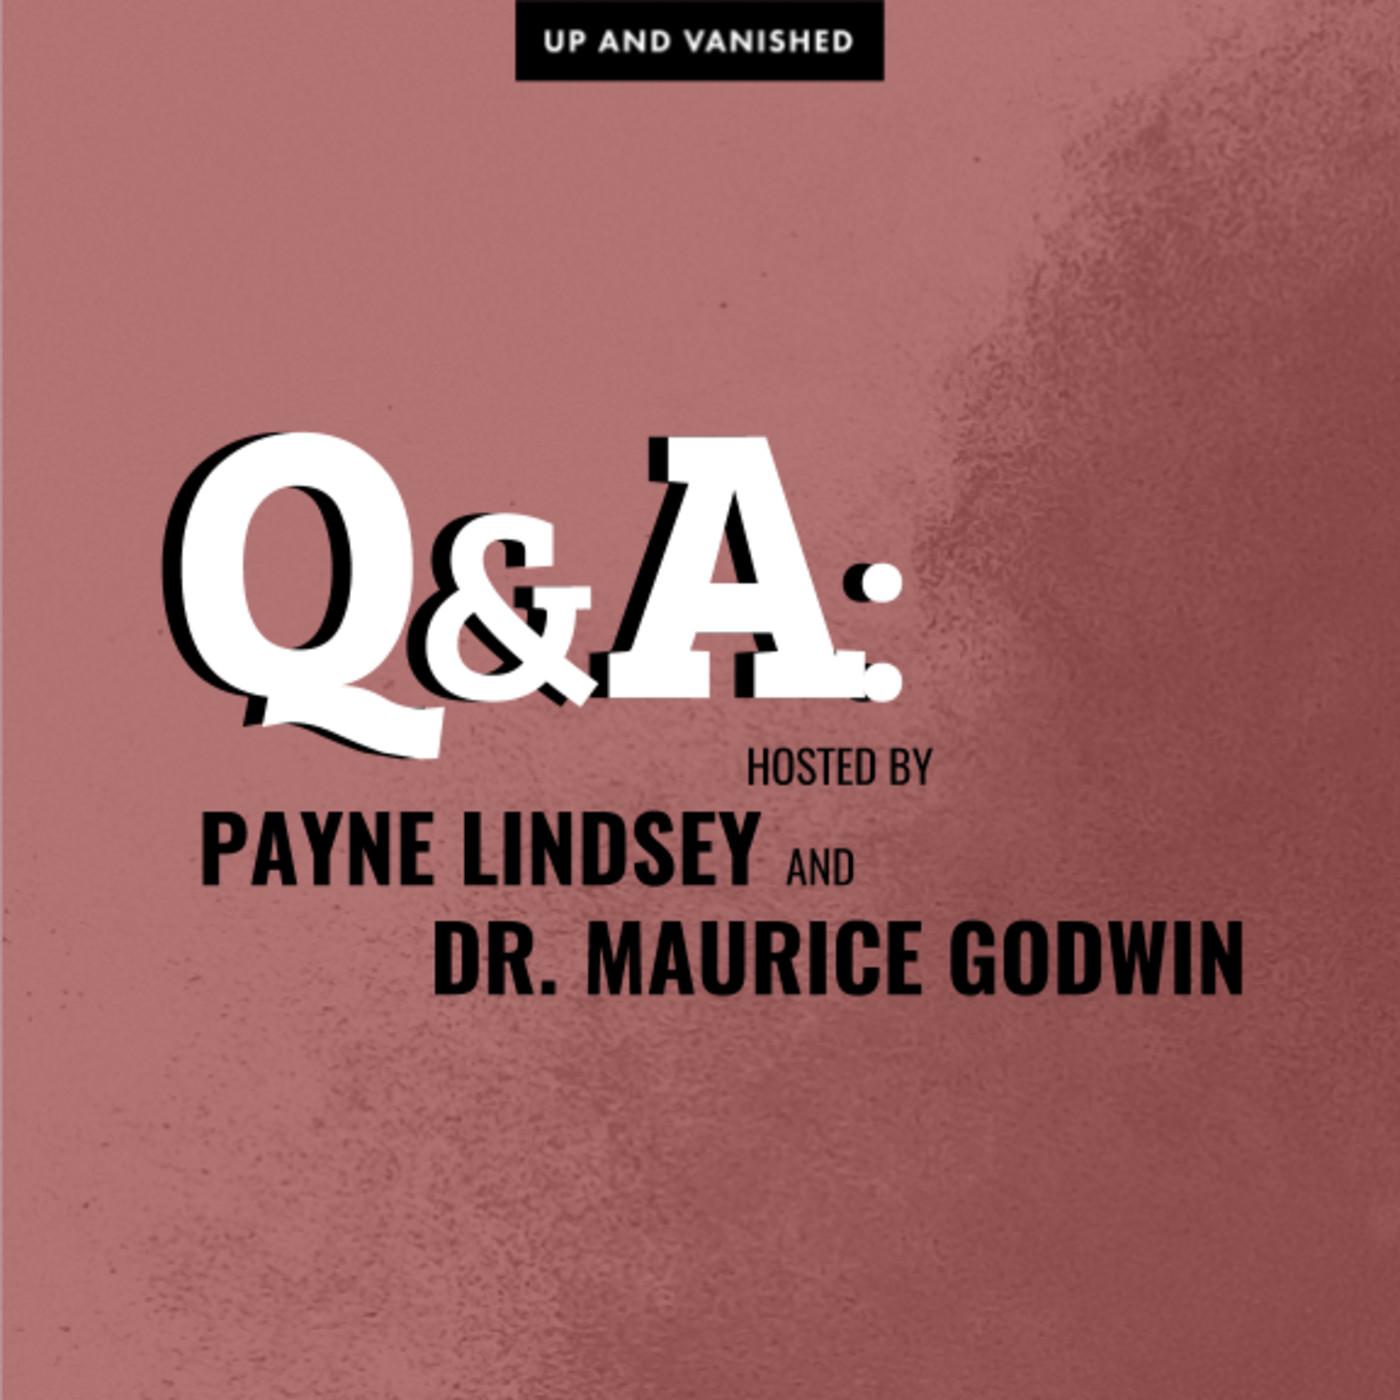 S1E : Q&A with Payne Lindsey & Dr. Maurice Godwin 12.22.16